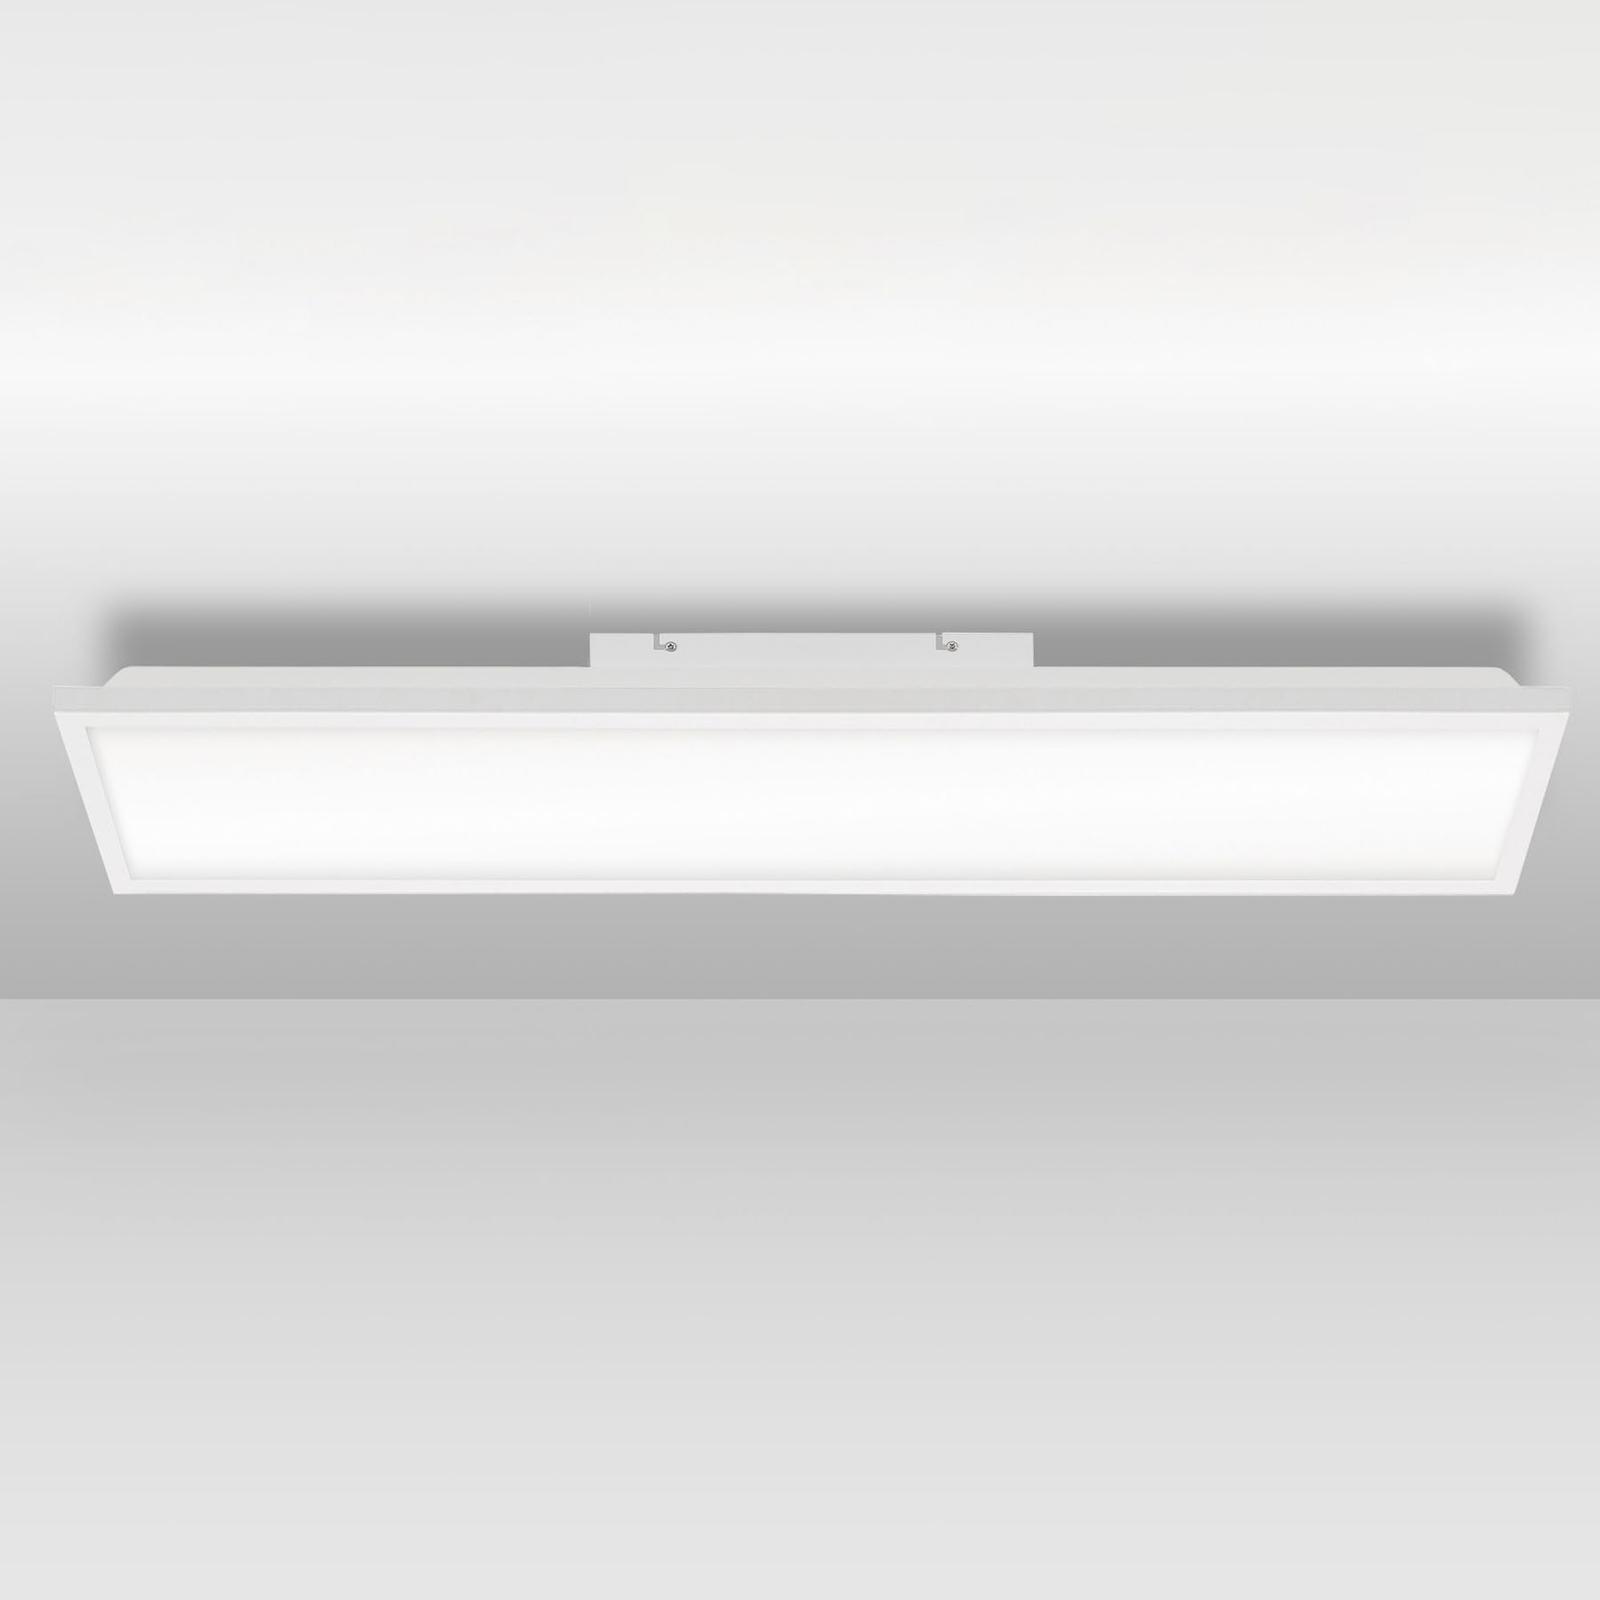 LED-taklampe Link WiFi med fjernkontroll